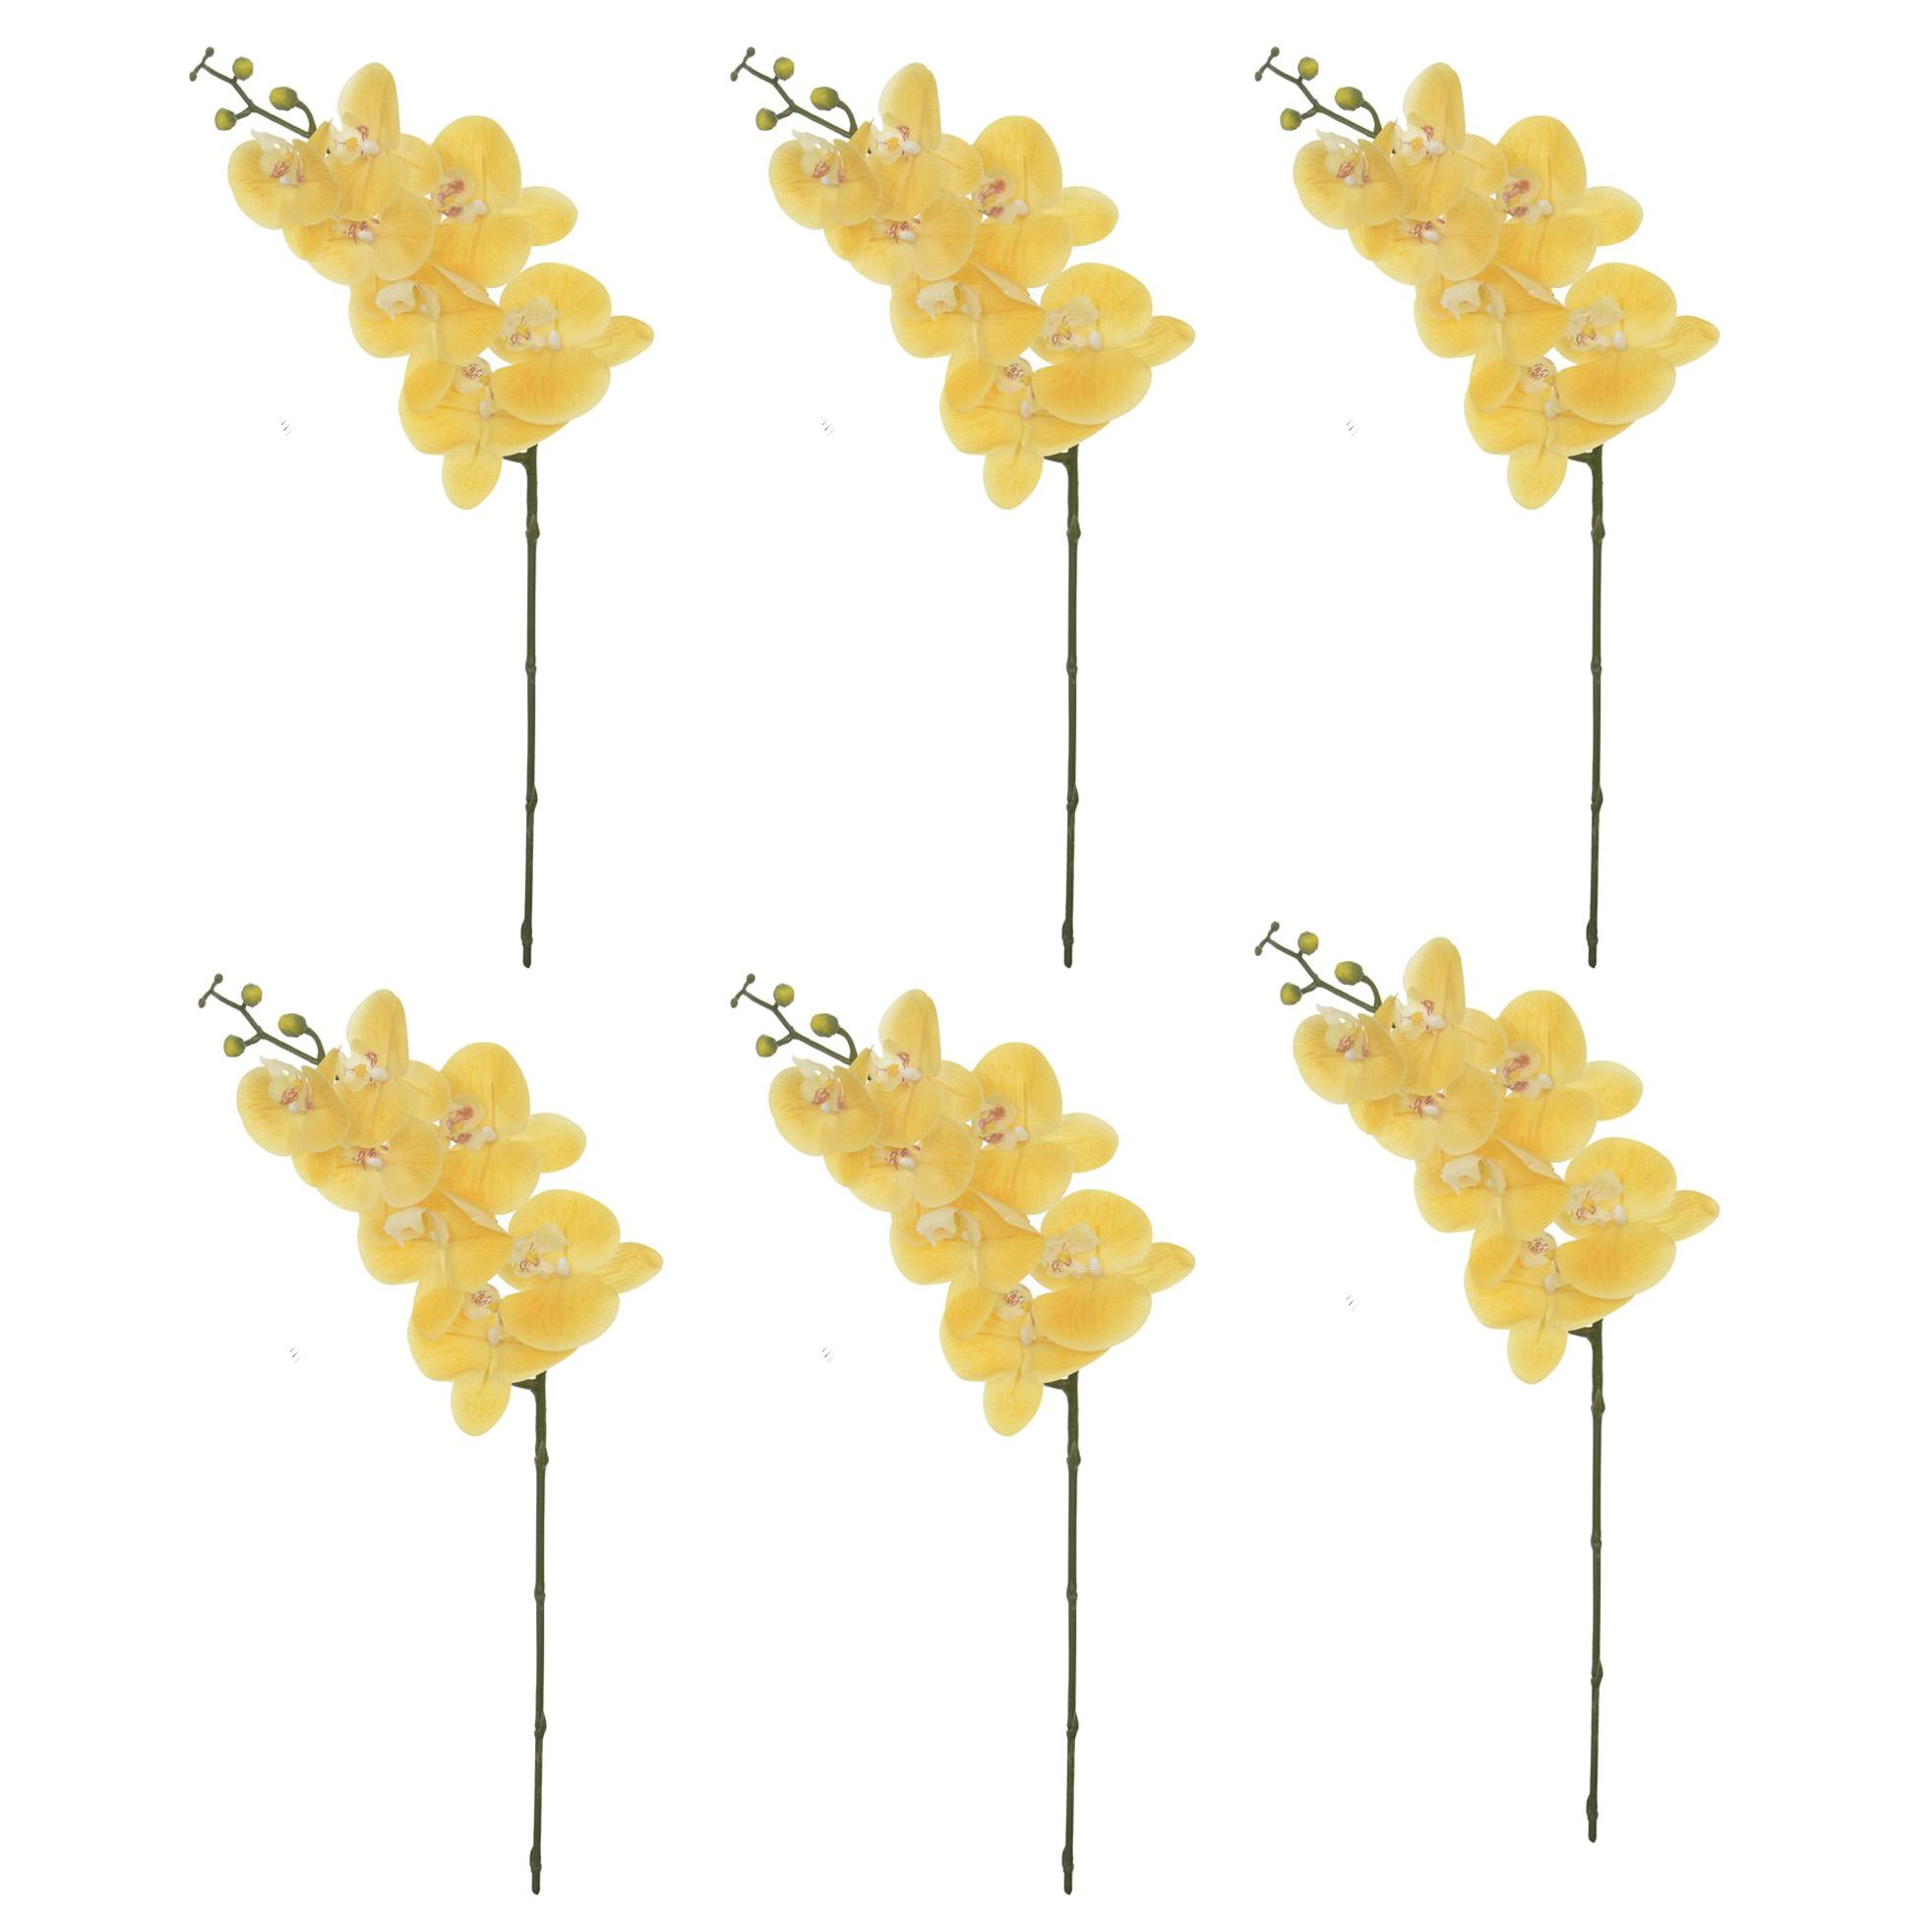 Kit com 6 Unidades - Flor Artificial Haste de Orquídea Toque Real Amarela | Formosinha